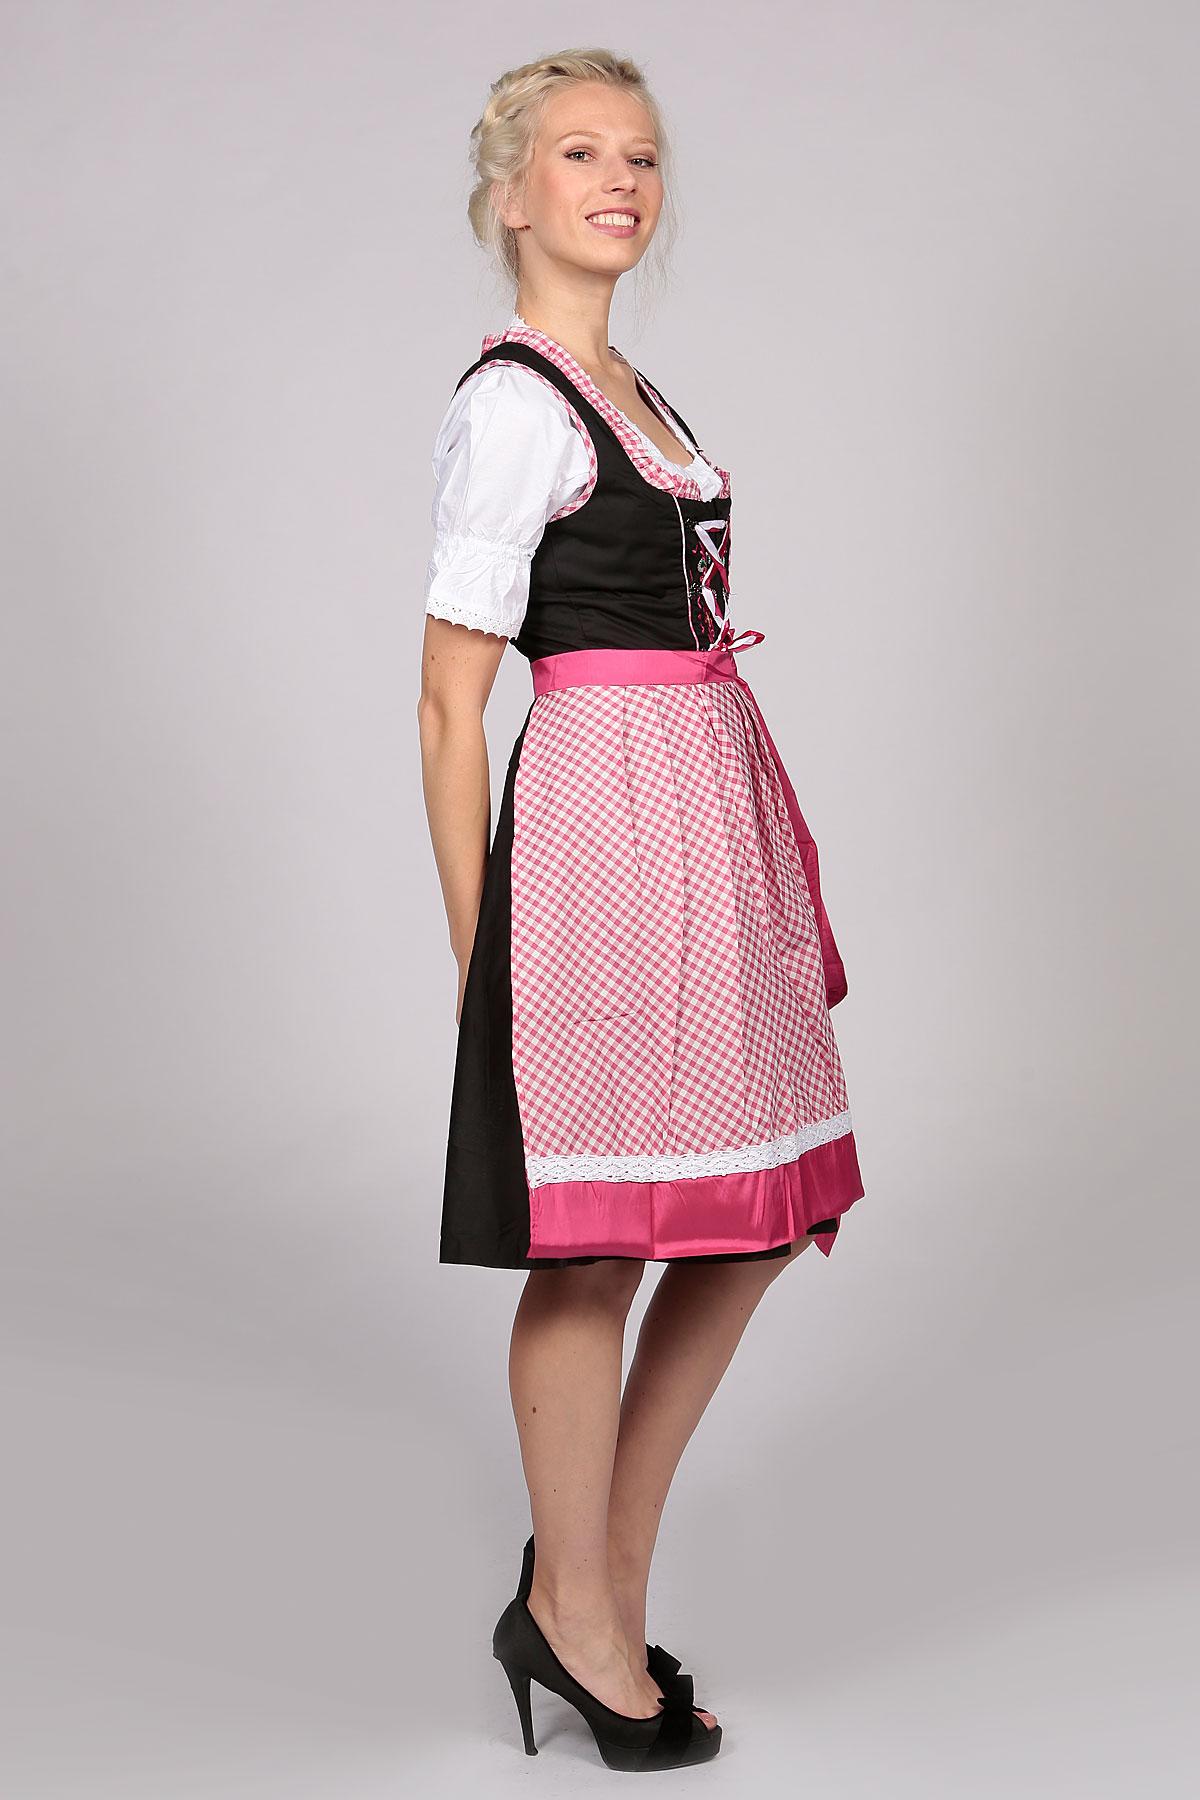 German Dirndl Dress Amara Black Pink Lederhosen Store